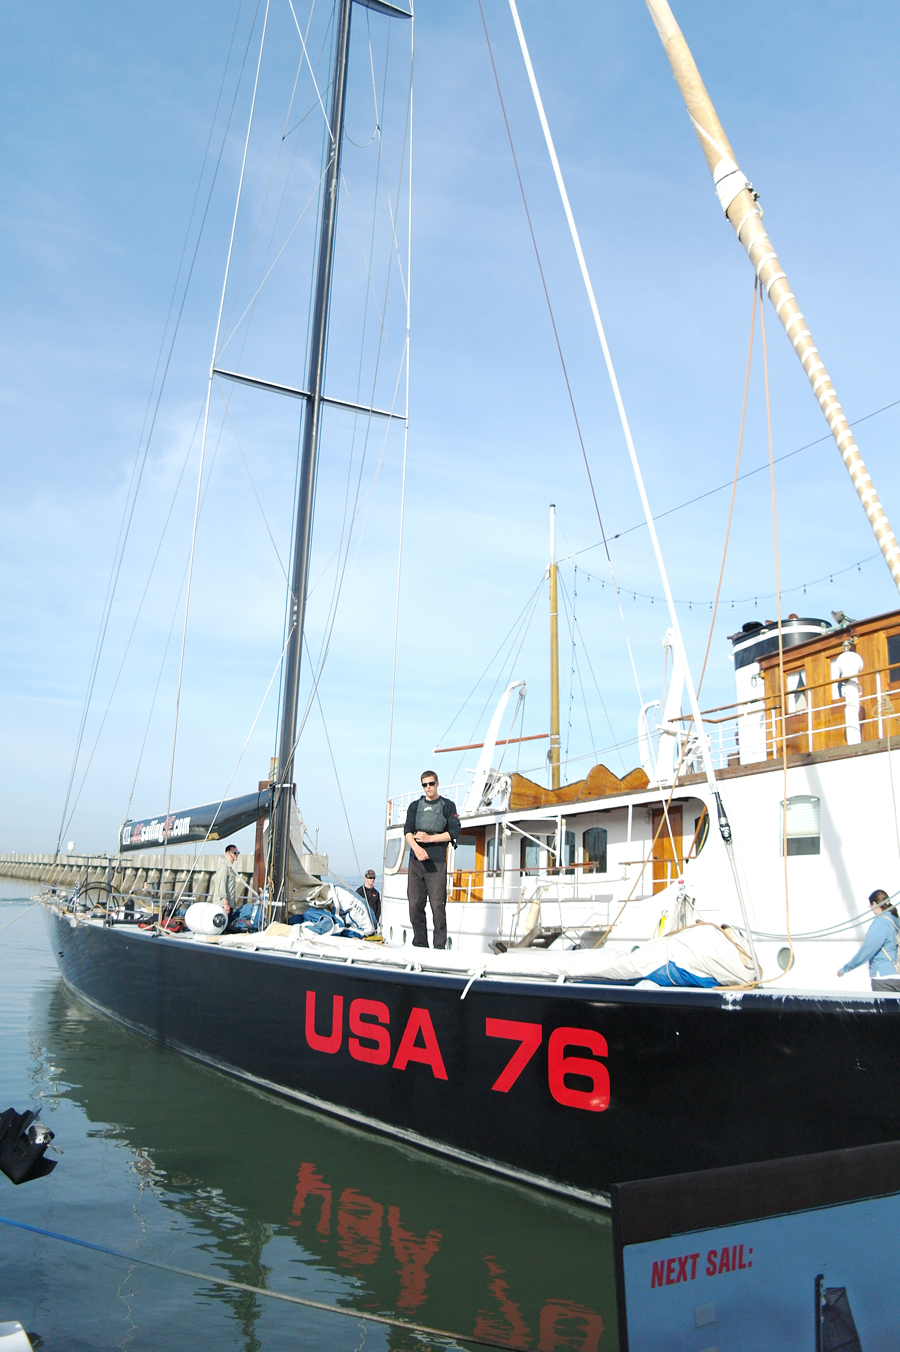 AC-USA-76